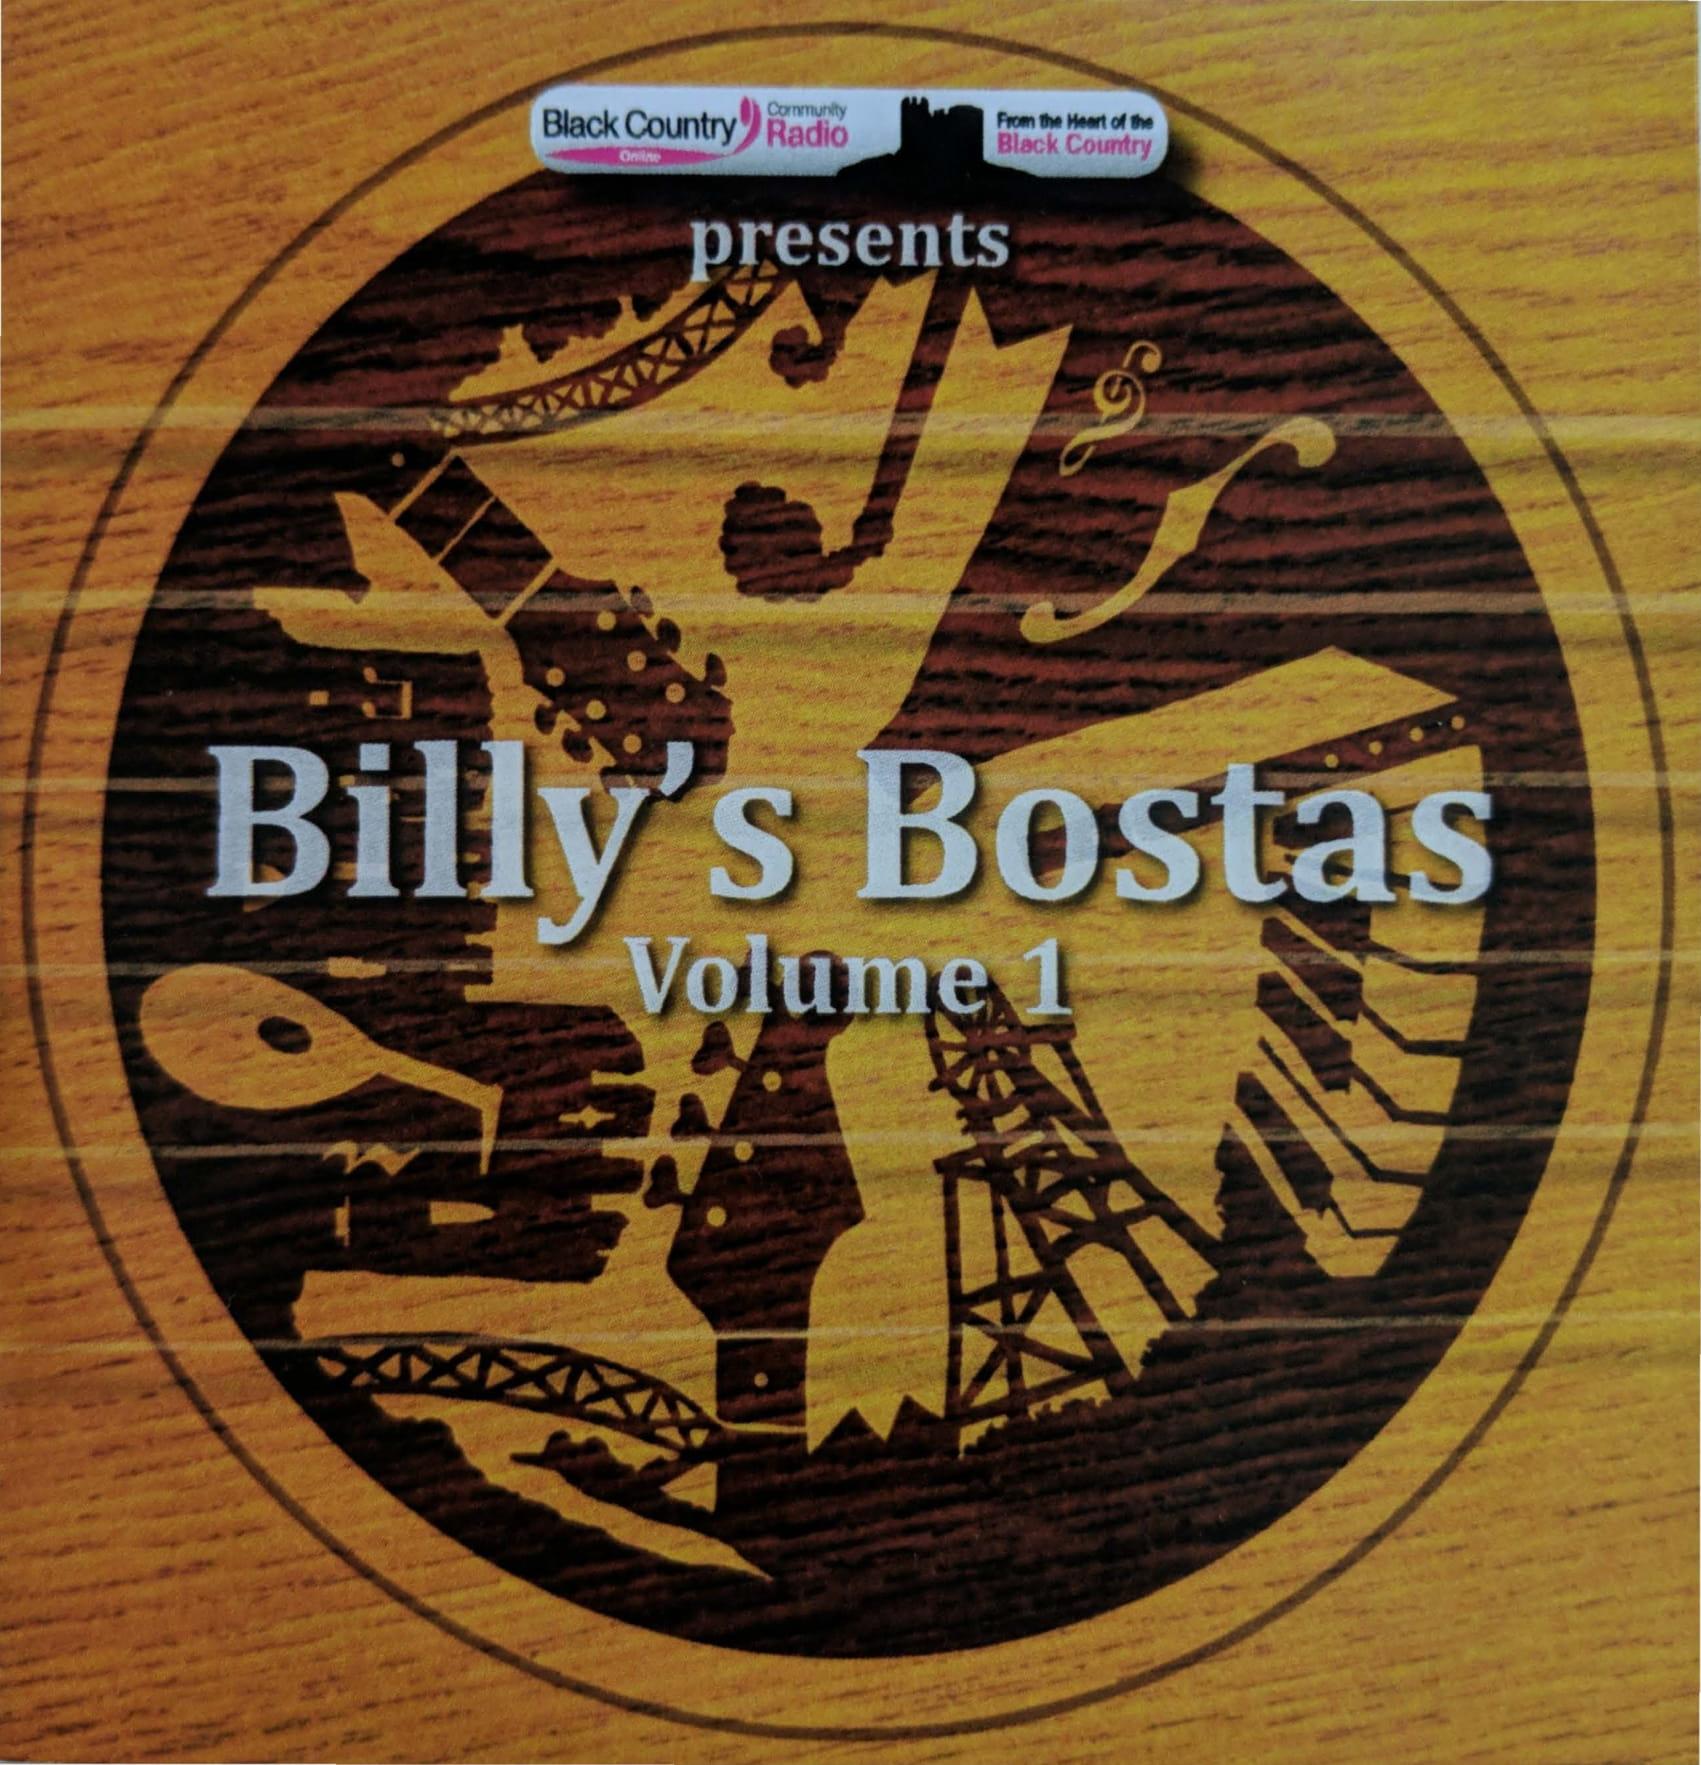 Billy's Bostas - Volume 1